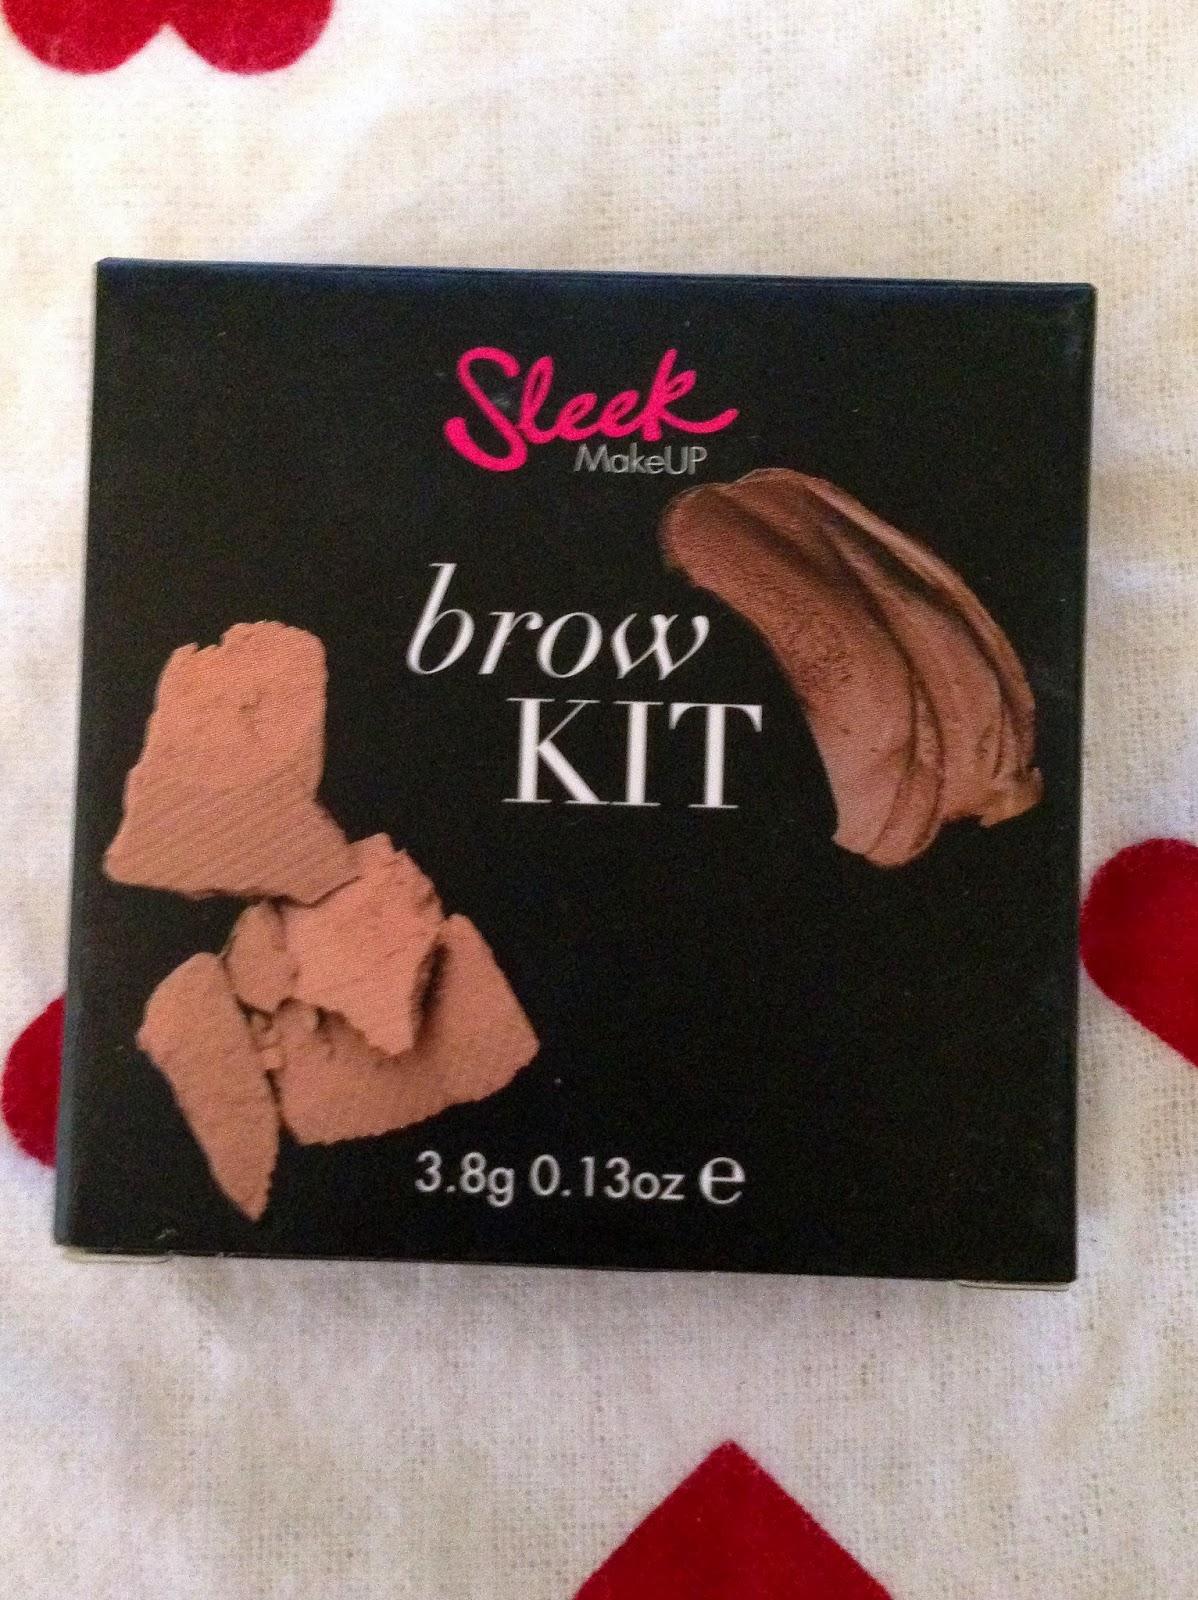 Sleek Brow Kit